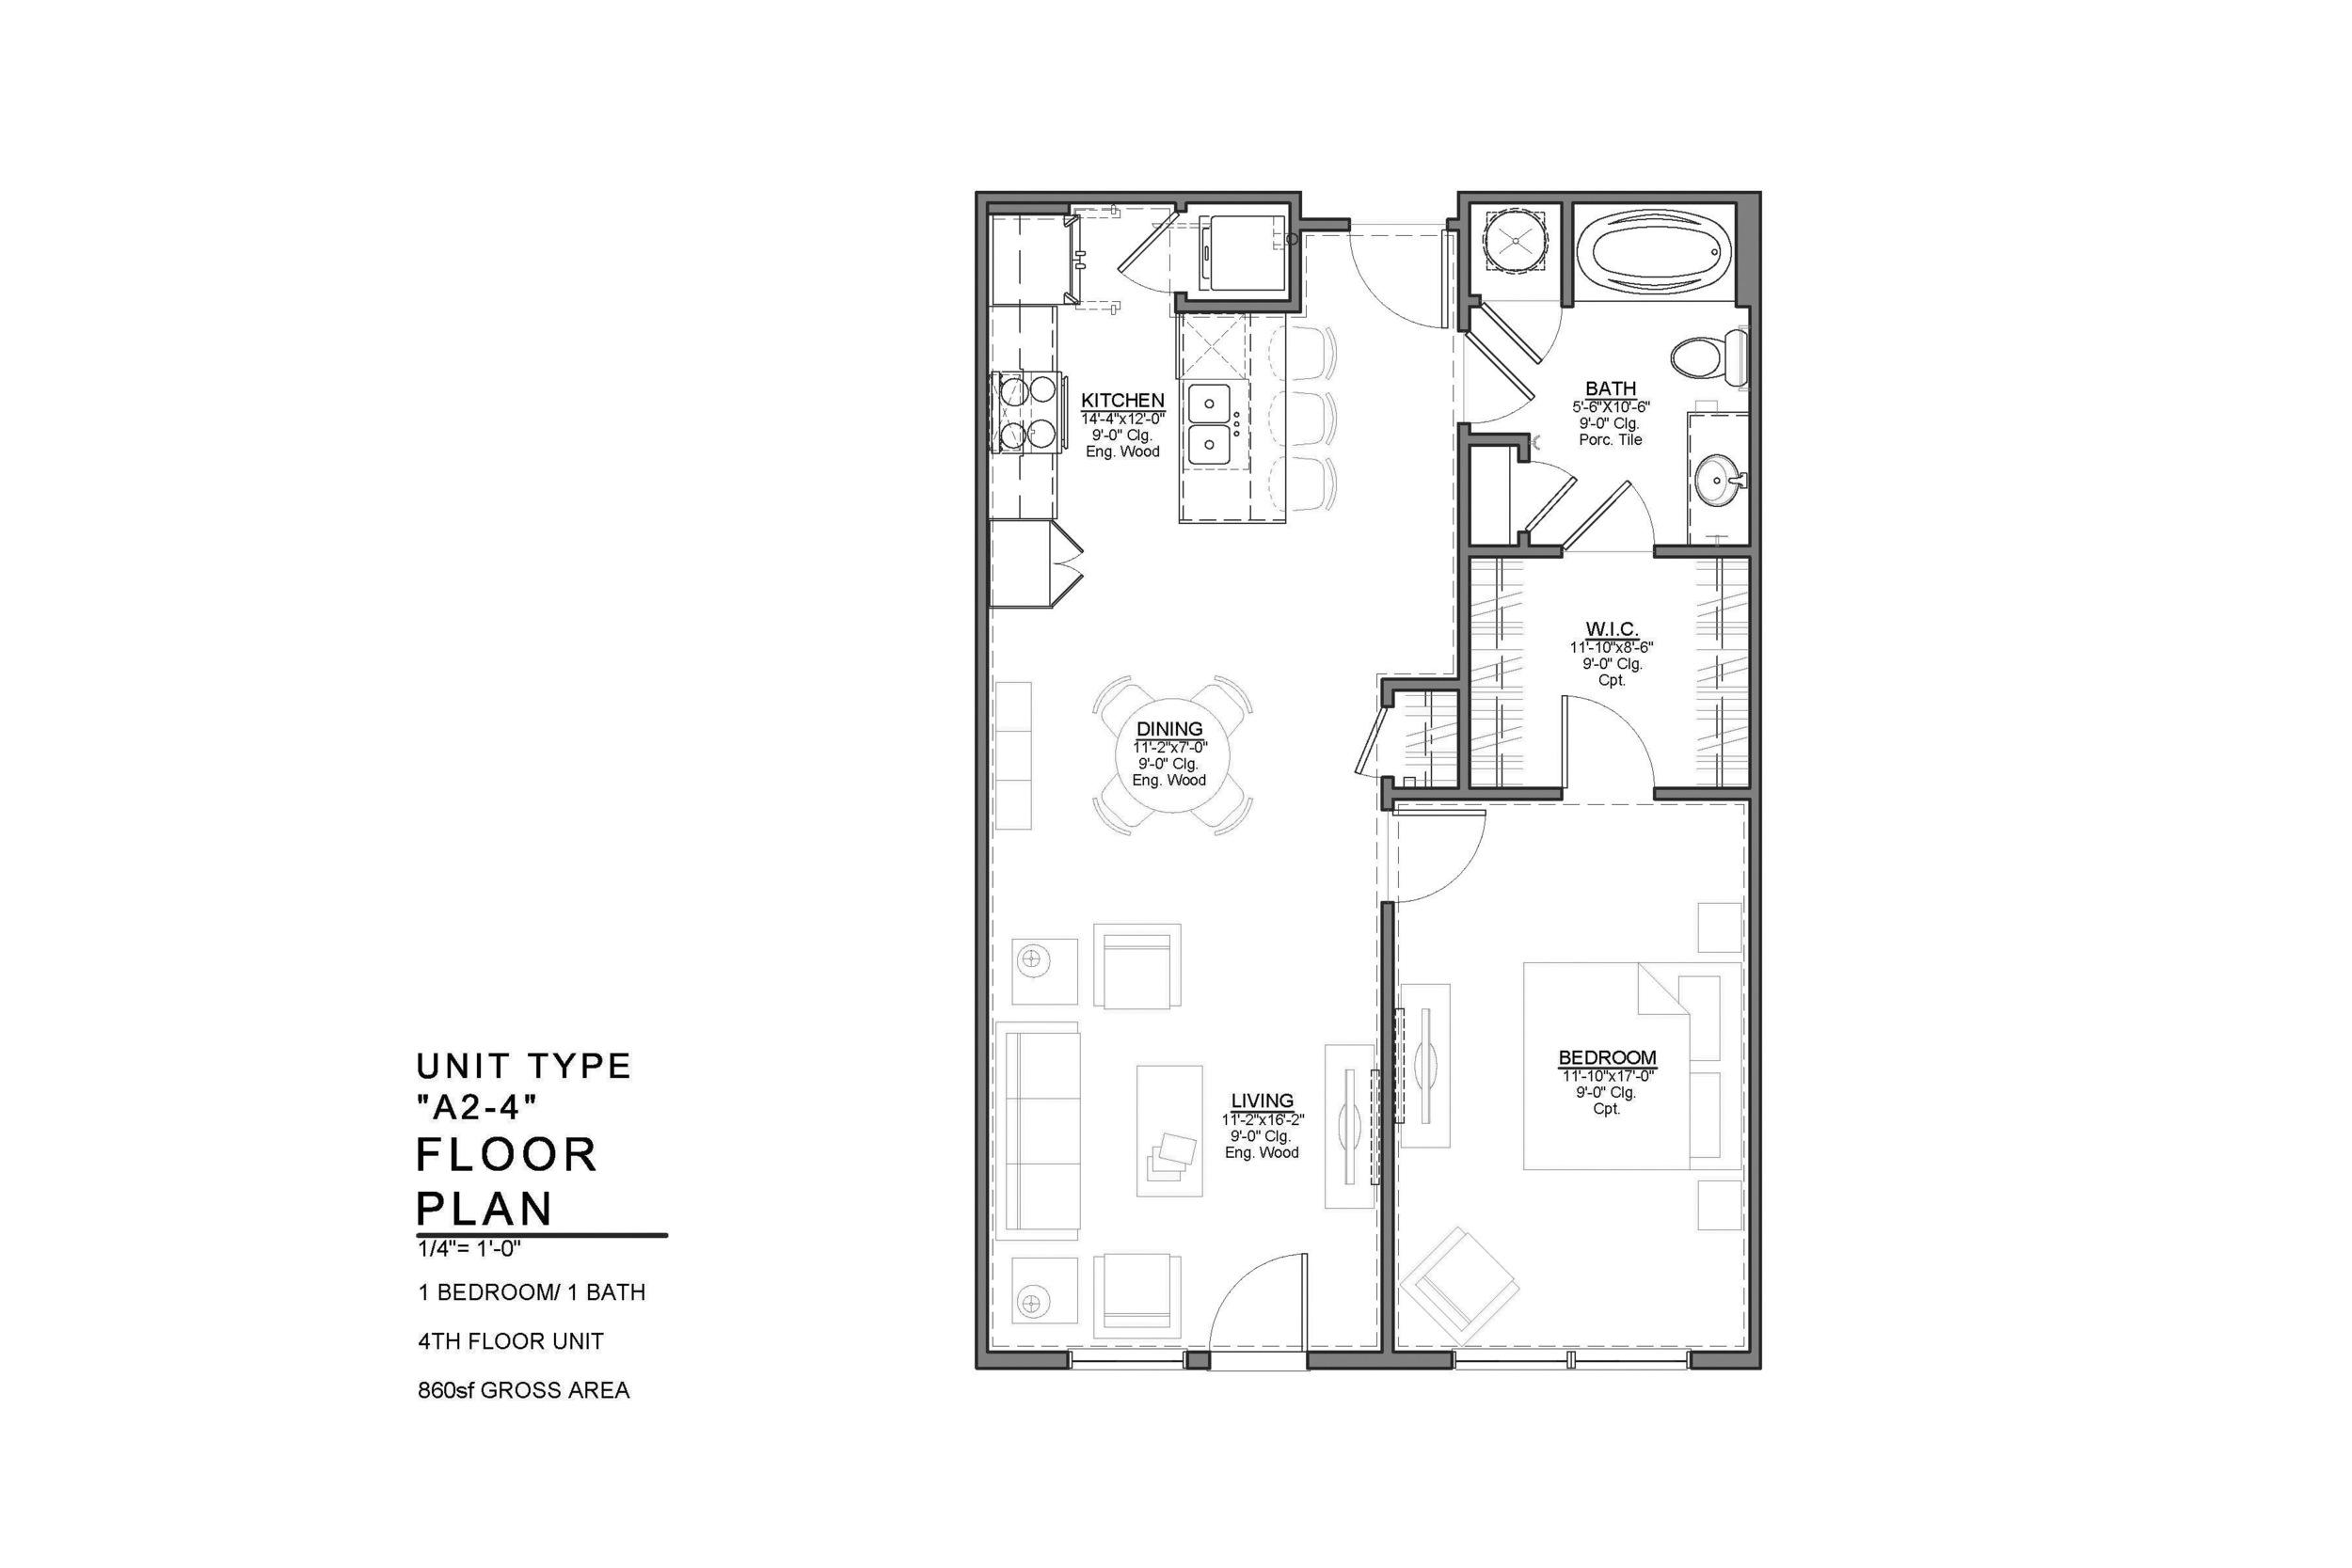 A2-4 FLOOR PLAN: 1 BEDROOM / 1 BATH